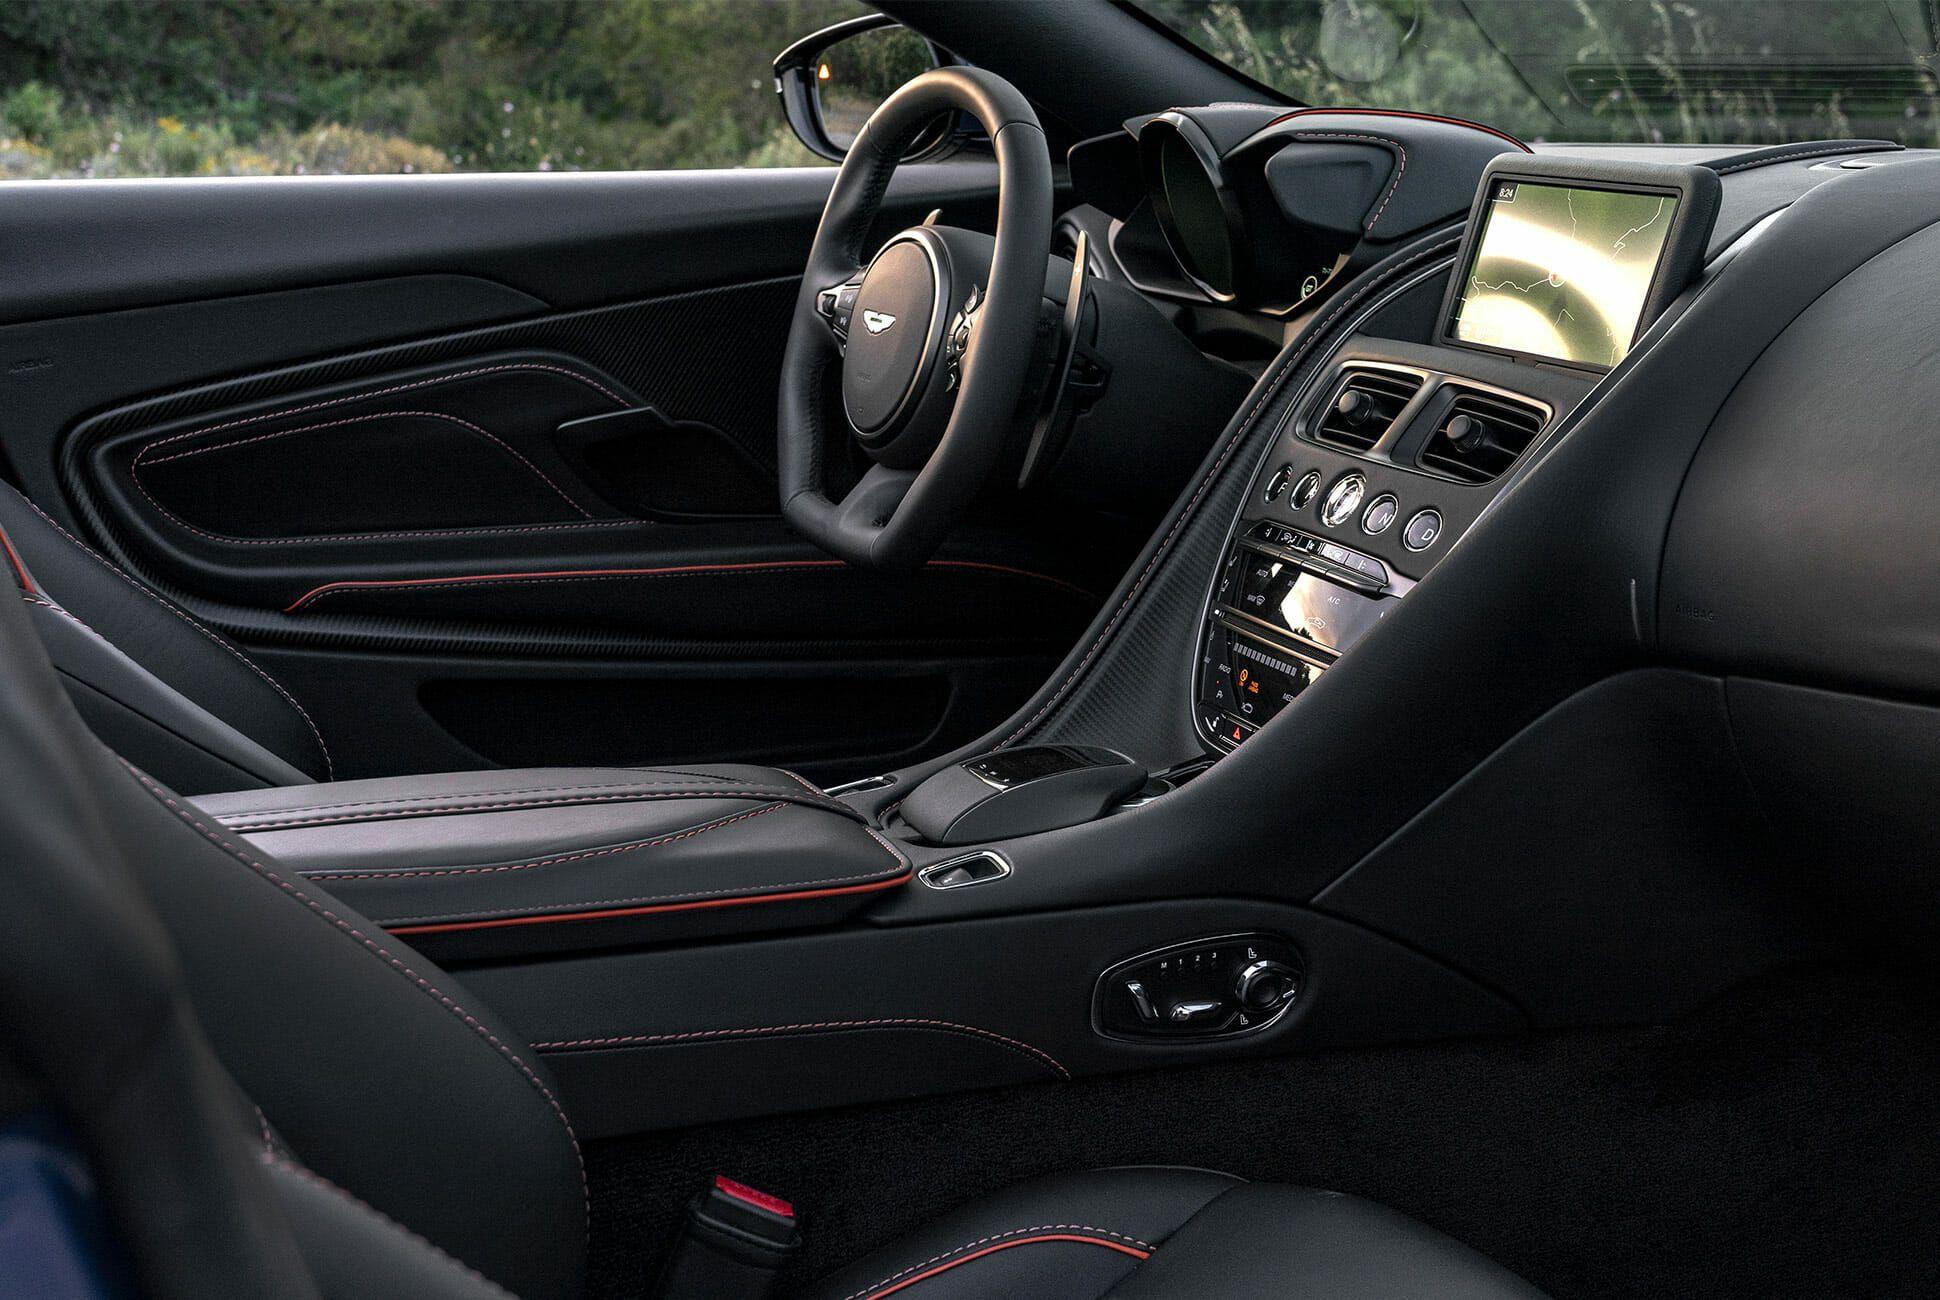 Aston-Martin-DBS-Superleggera-Volante-Review-gear-patrol-slide-6